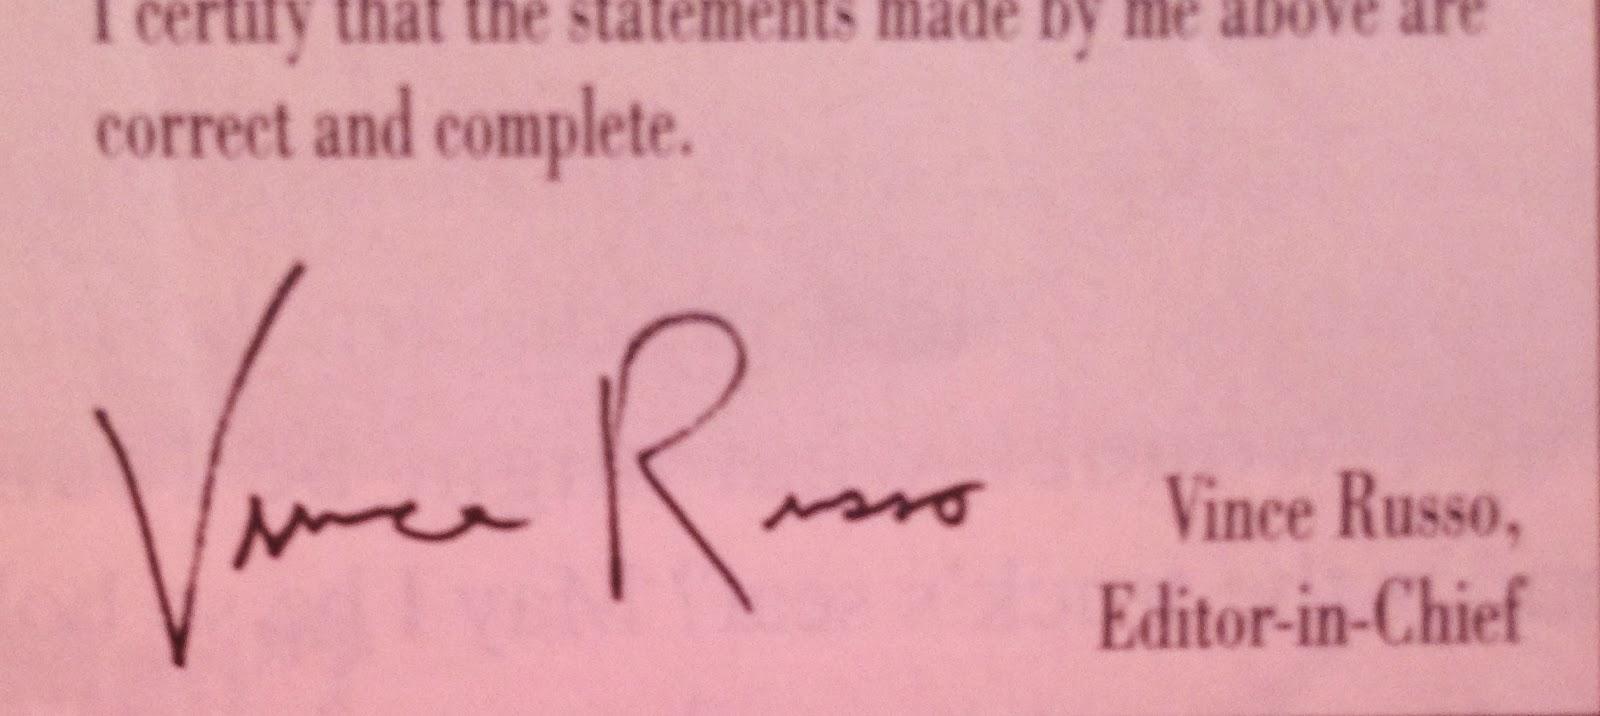 WWE: WWF RAW MAGAZINE - January 1998 - Vince Russo's signature